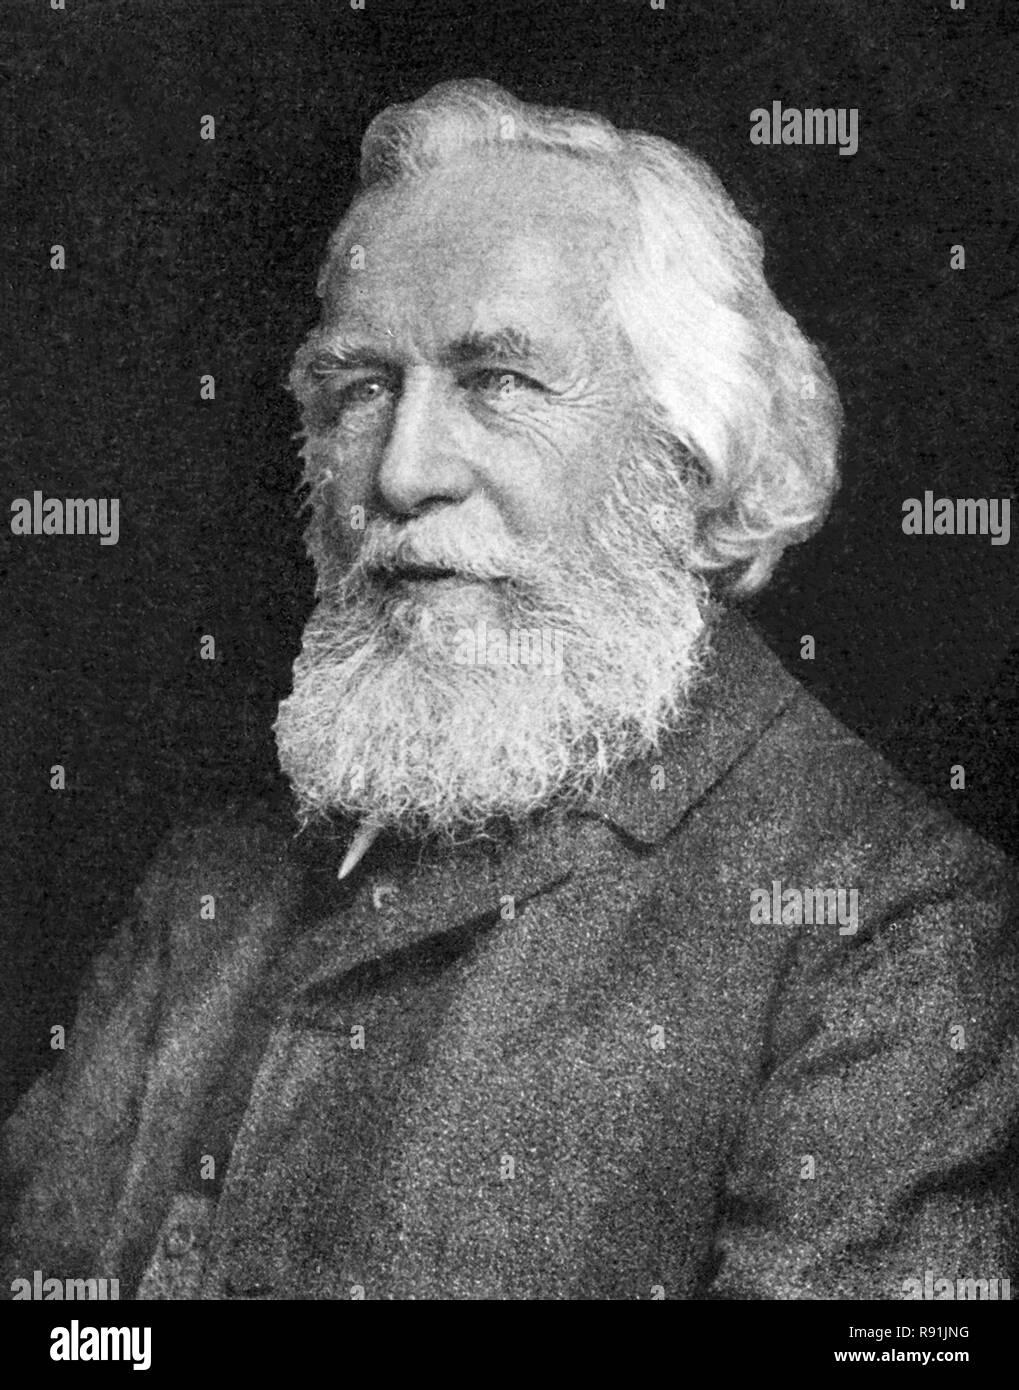 Ernst Heinrich Philipp August Haeckel (1834 - 1919) Tedesco biologo naturalista, professore e biologo marino Immagini Stock